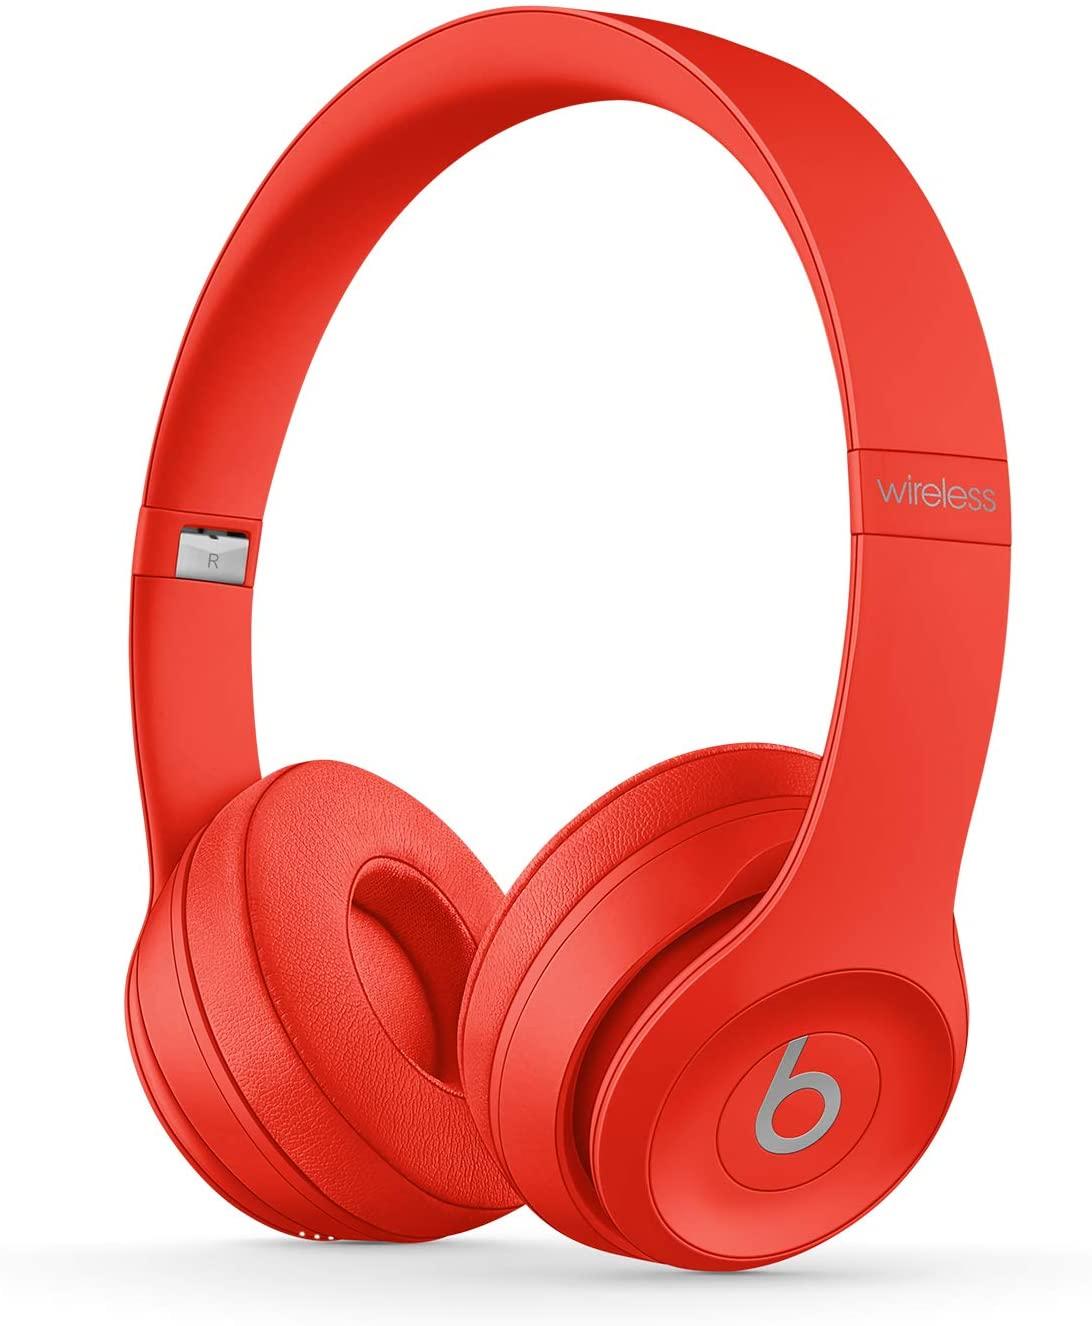 Minimo record per le Beats Solo 3 Wireless a 129,99 euro; Beats Studio3 a 199€